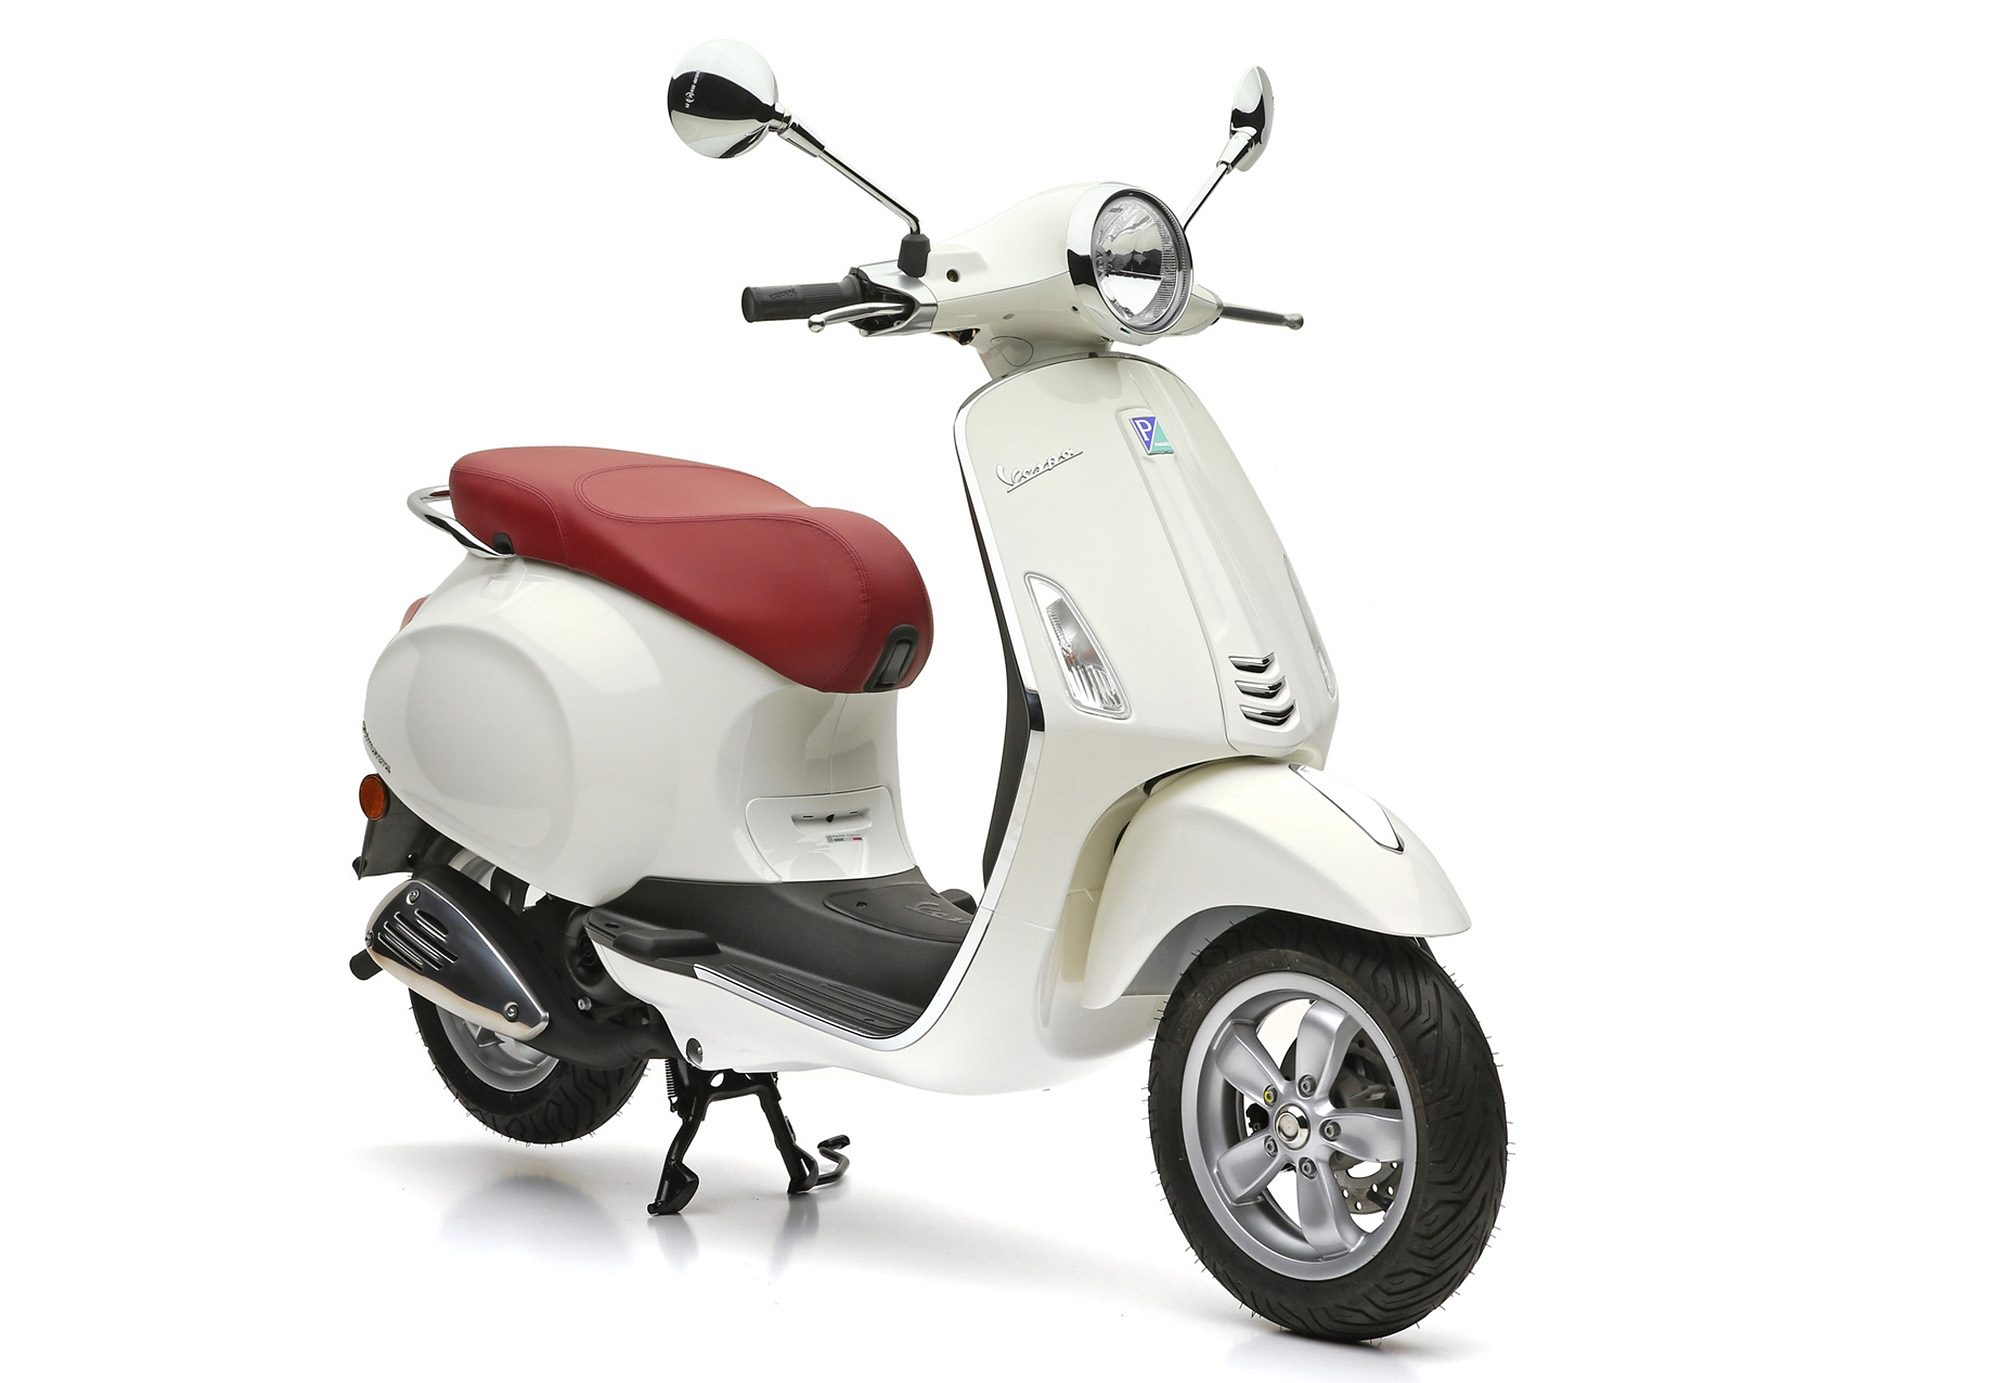 Motorroller, 49 ccm, 4,35 PS, 45 km/h, weiss, »Primavera«, Vespa